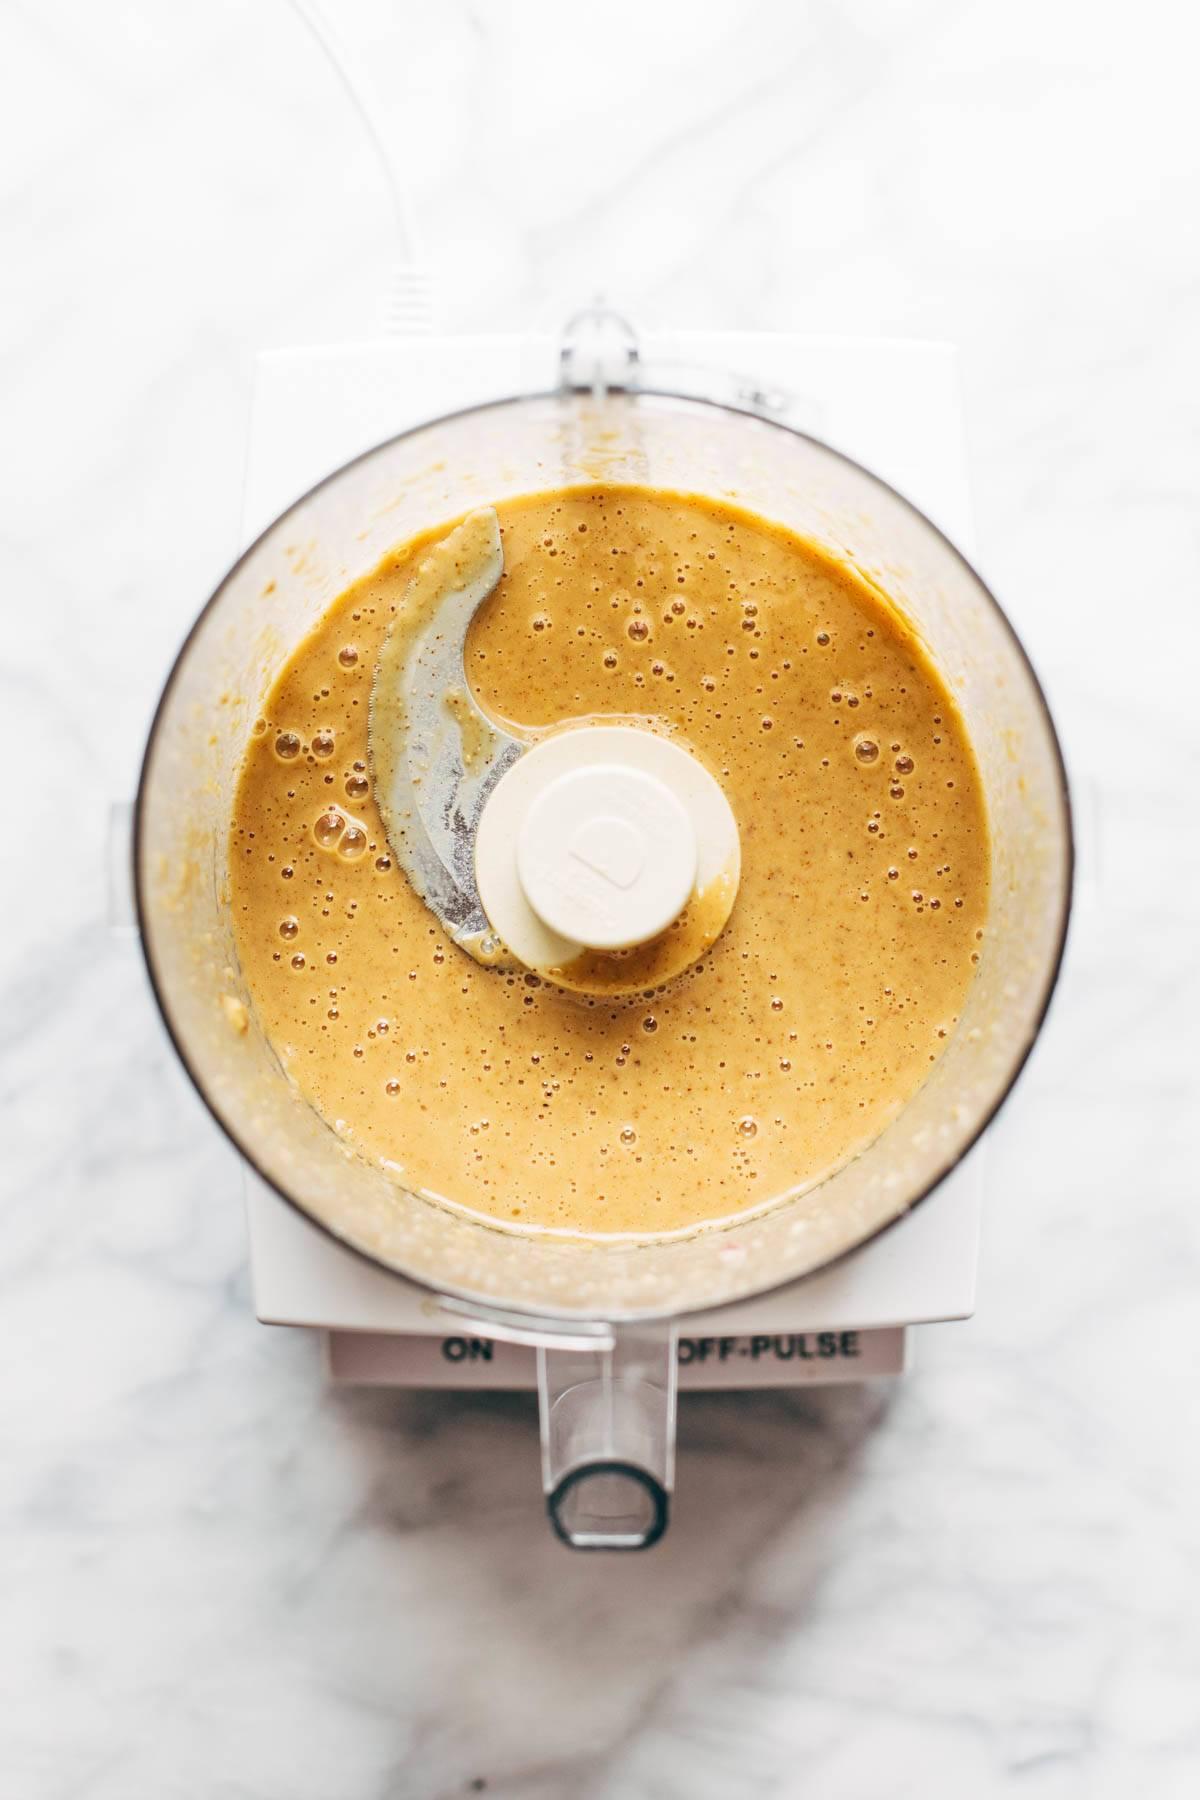 Sauce in a food processor.